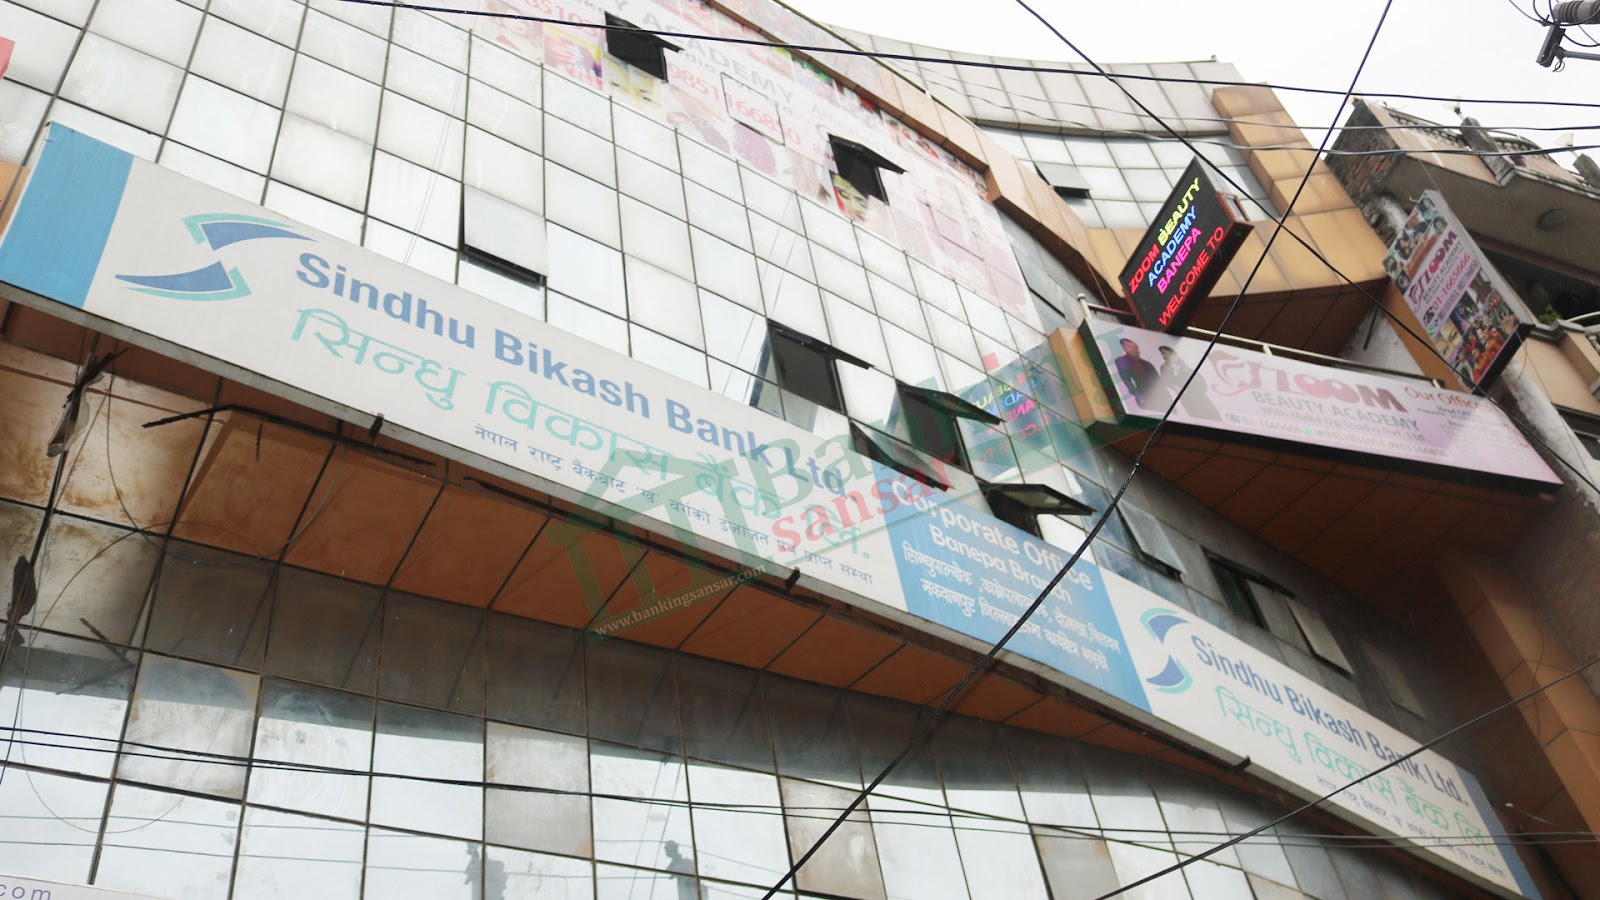 Sindu Bikas Bank